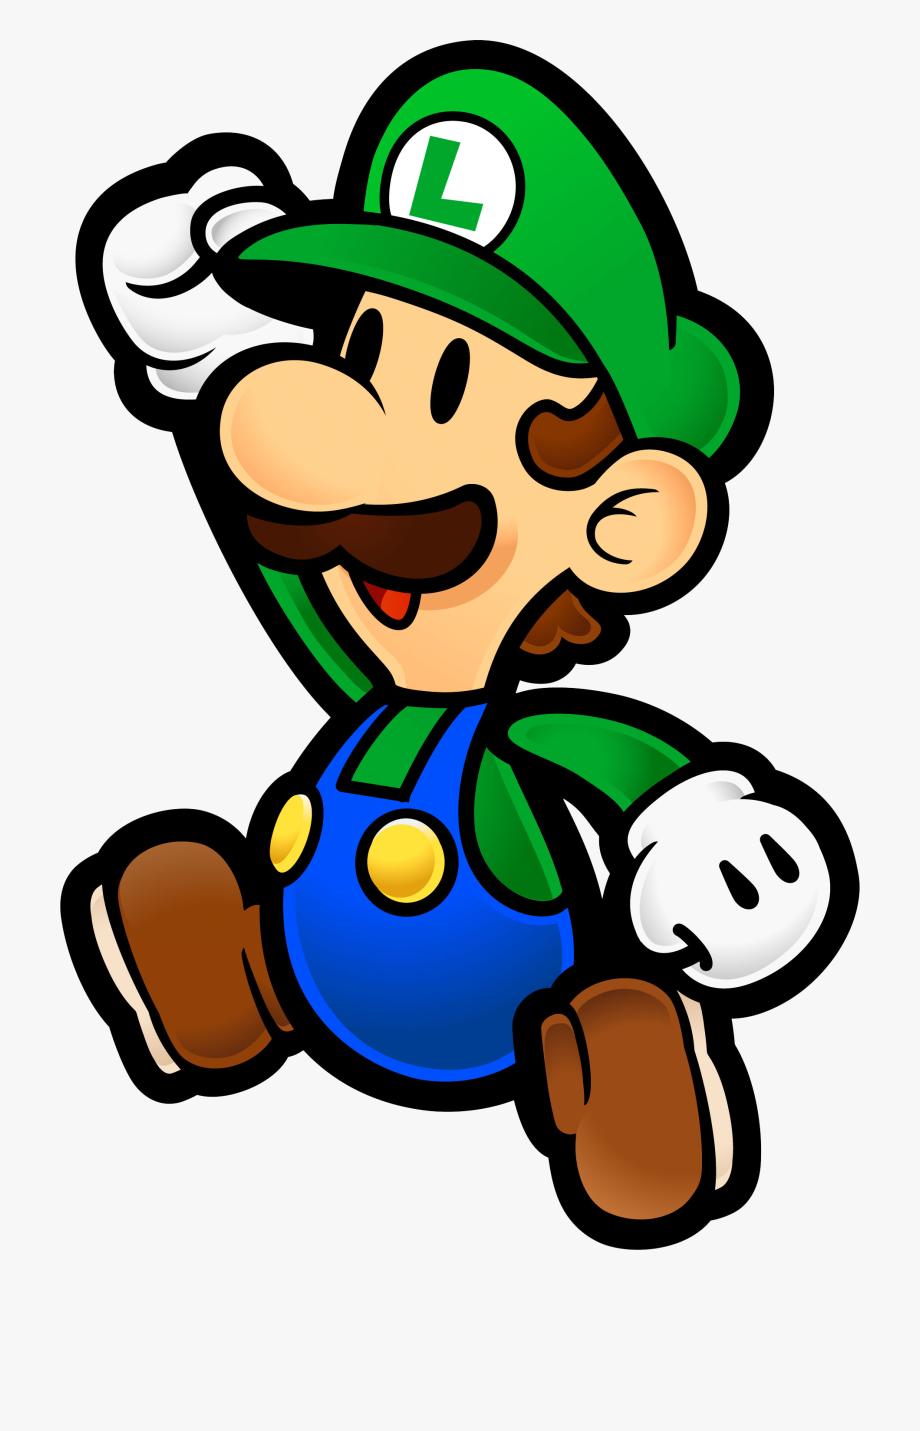 Super Mario Clipart Green.